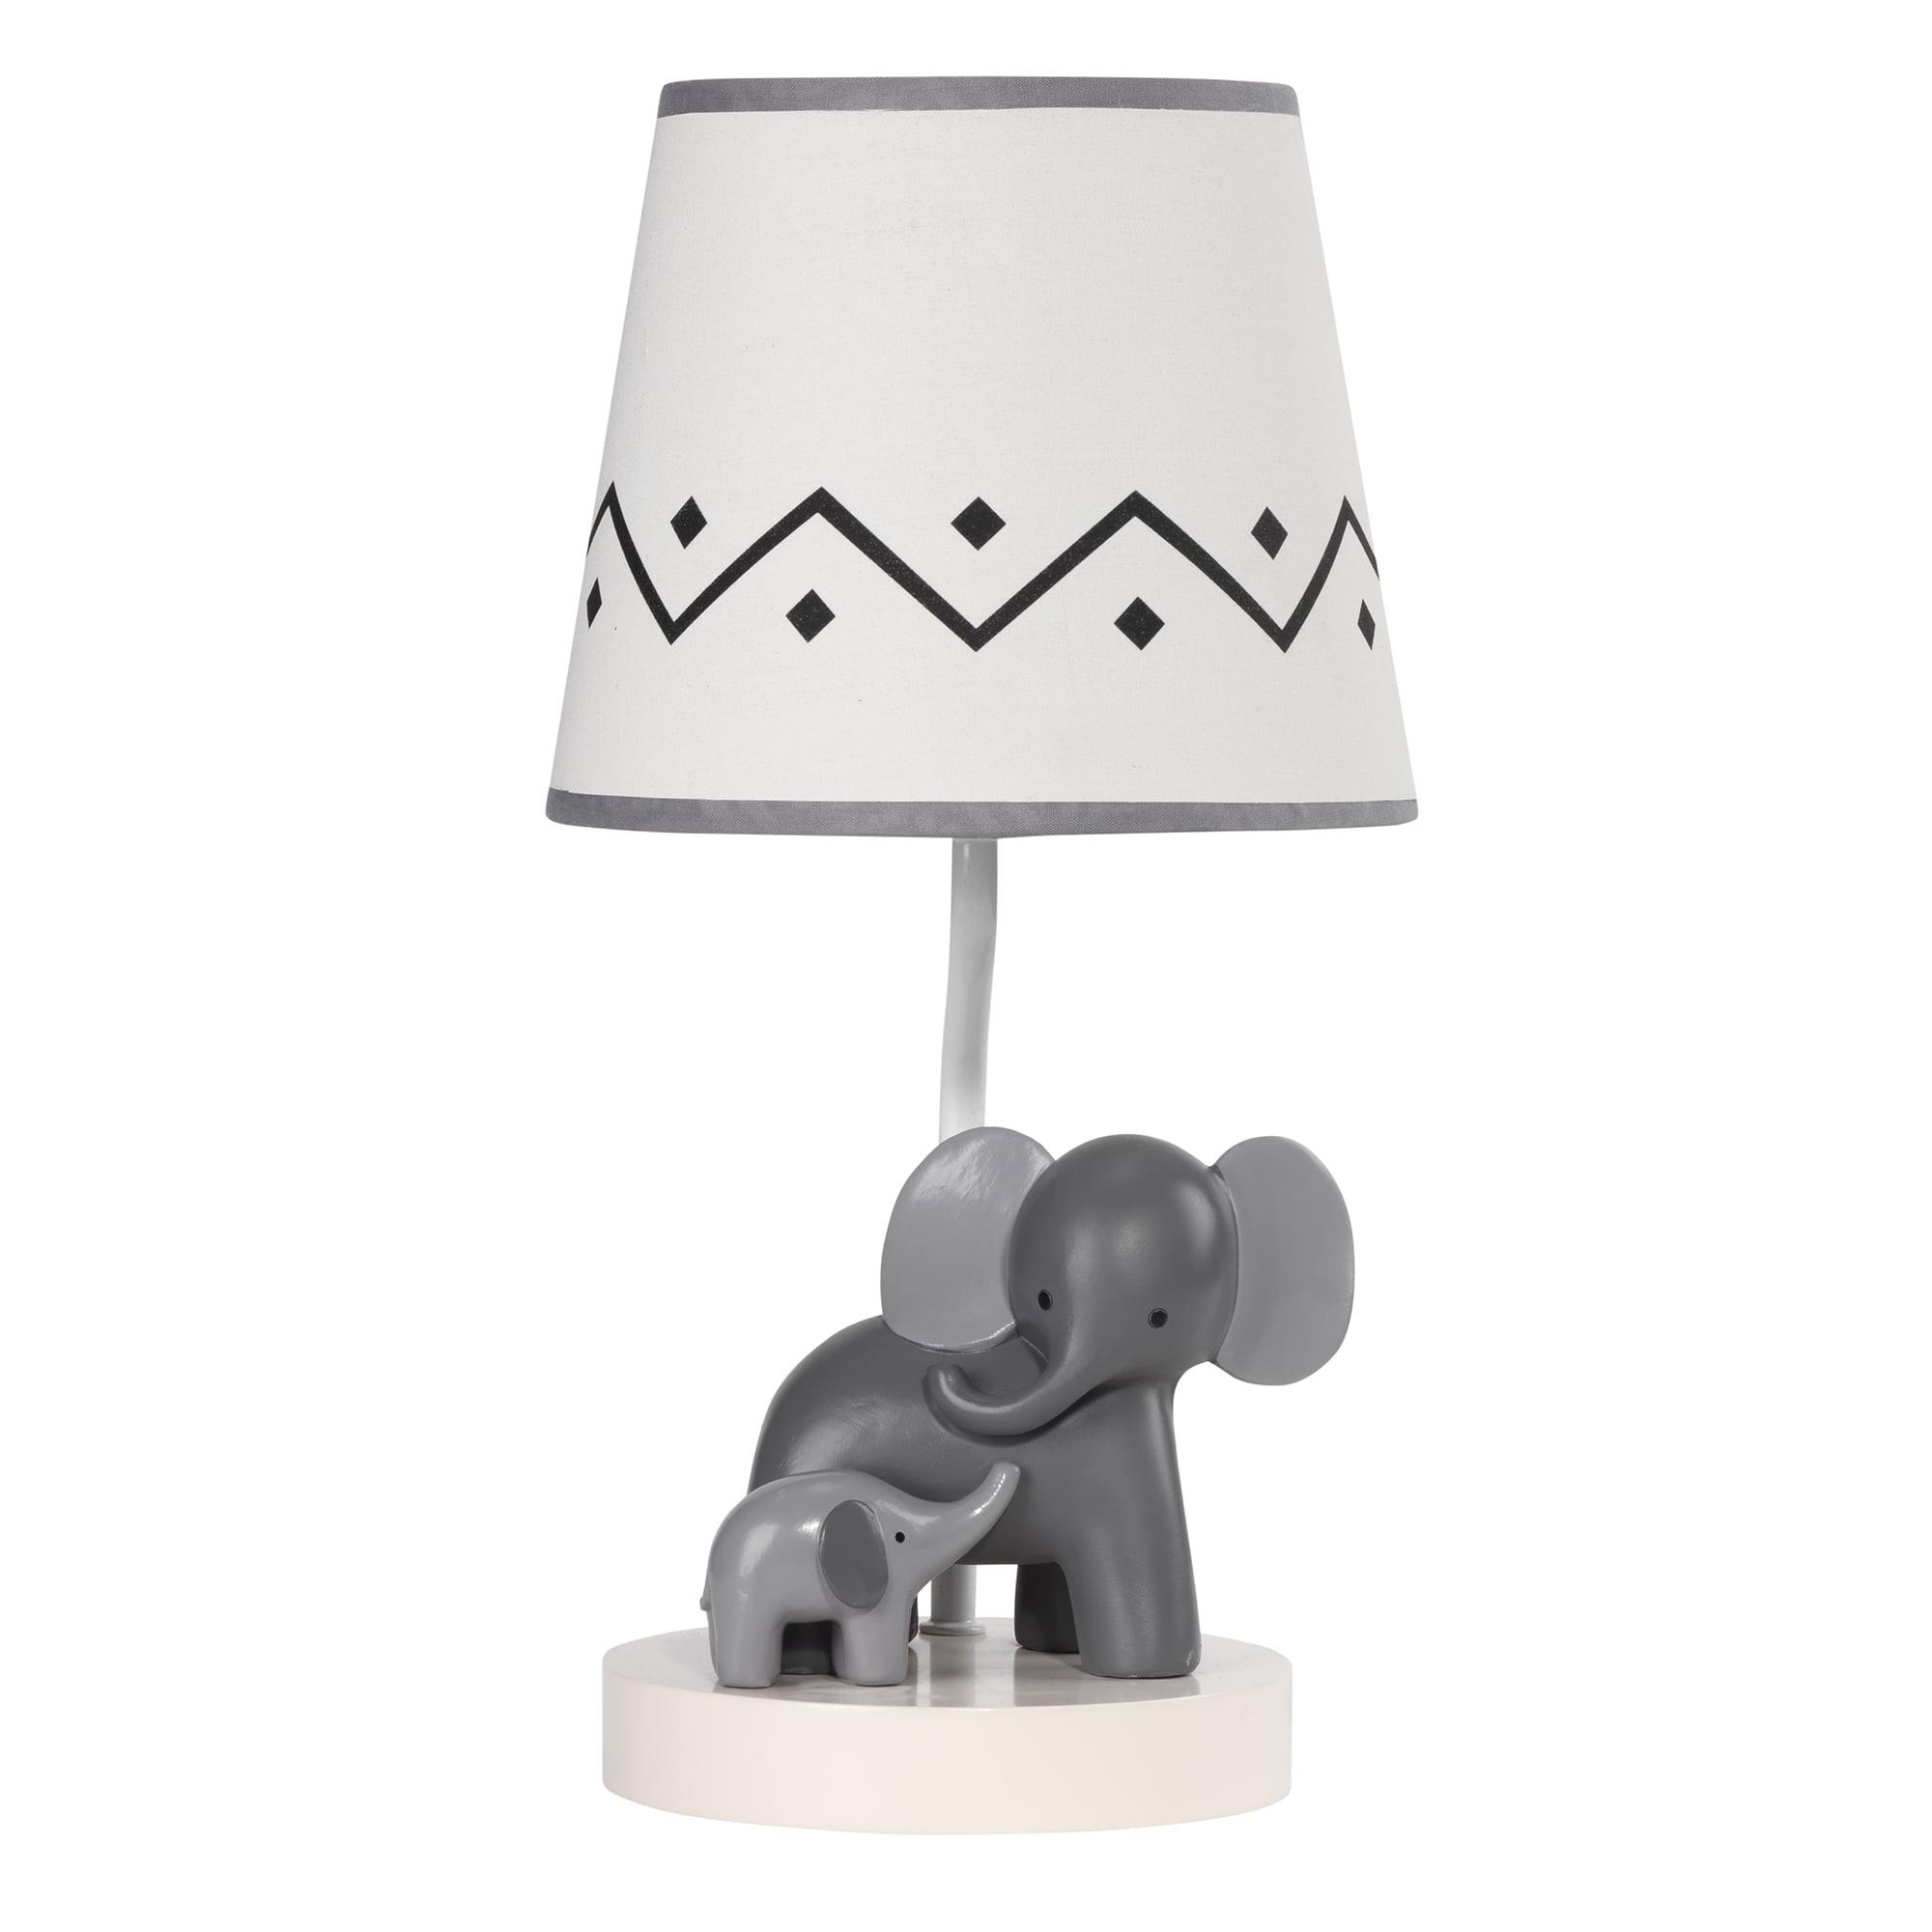 Lambs & Ivy Me & Mama White Gray Elephant Nursery Lamp with Shade & Bulb by Lambs & Ivy